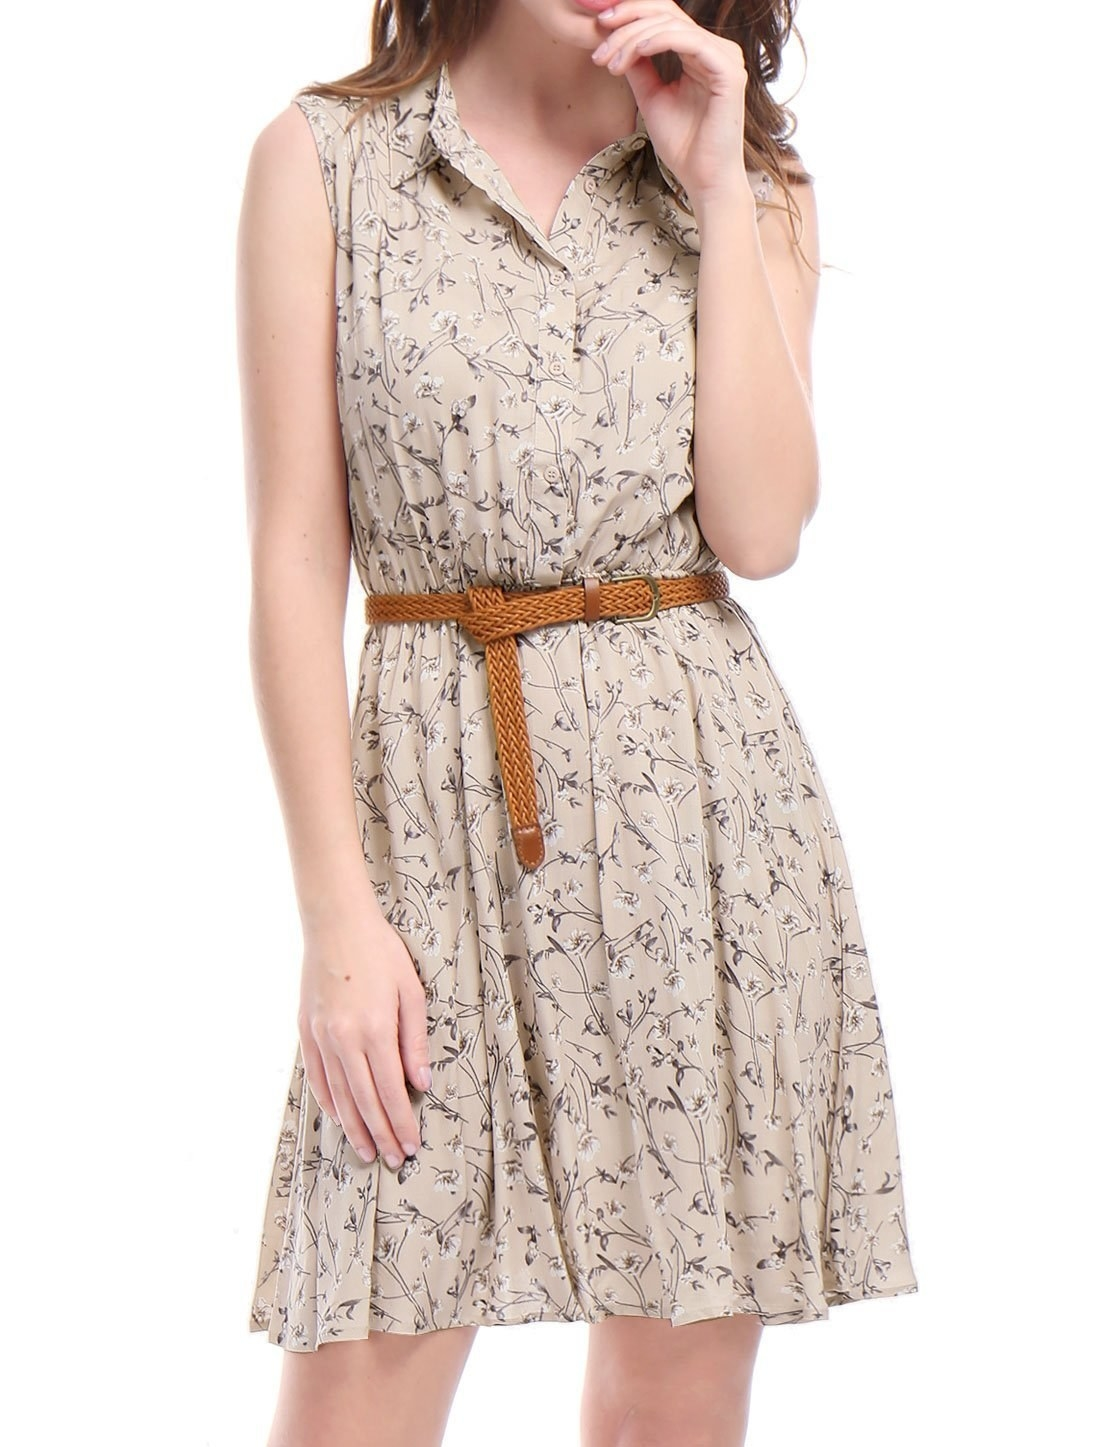 0c3f39dc09 47 Cheap Summer Dresses That ll Make The Heat A Little More Bearable